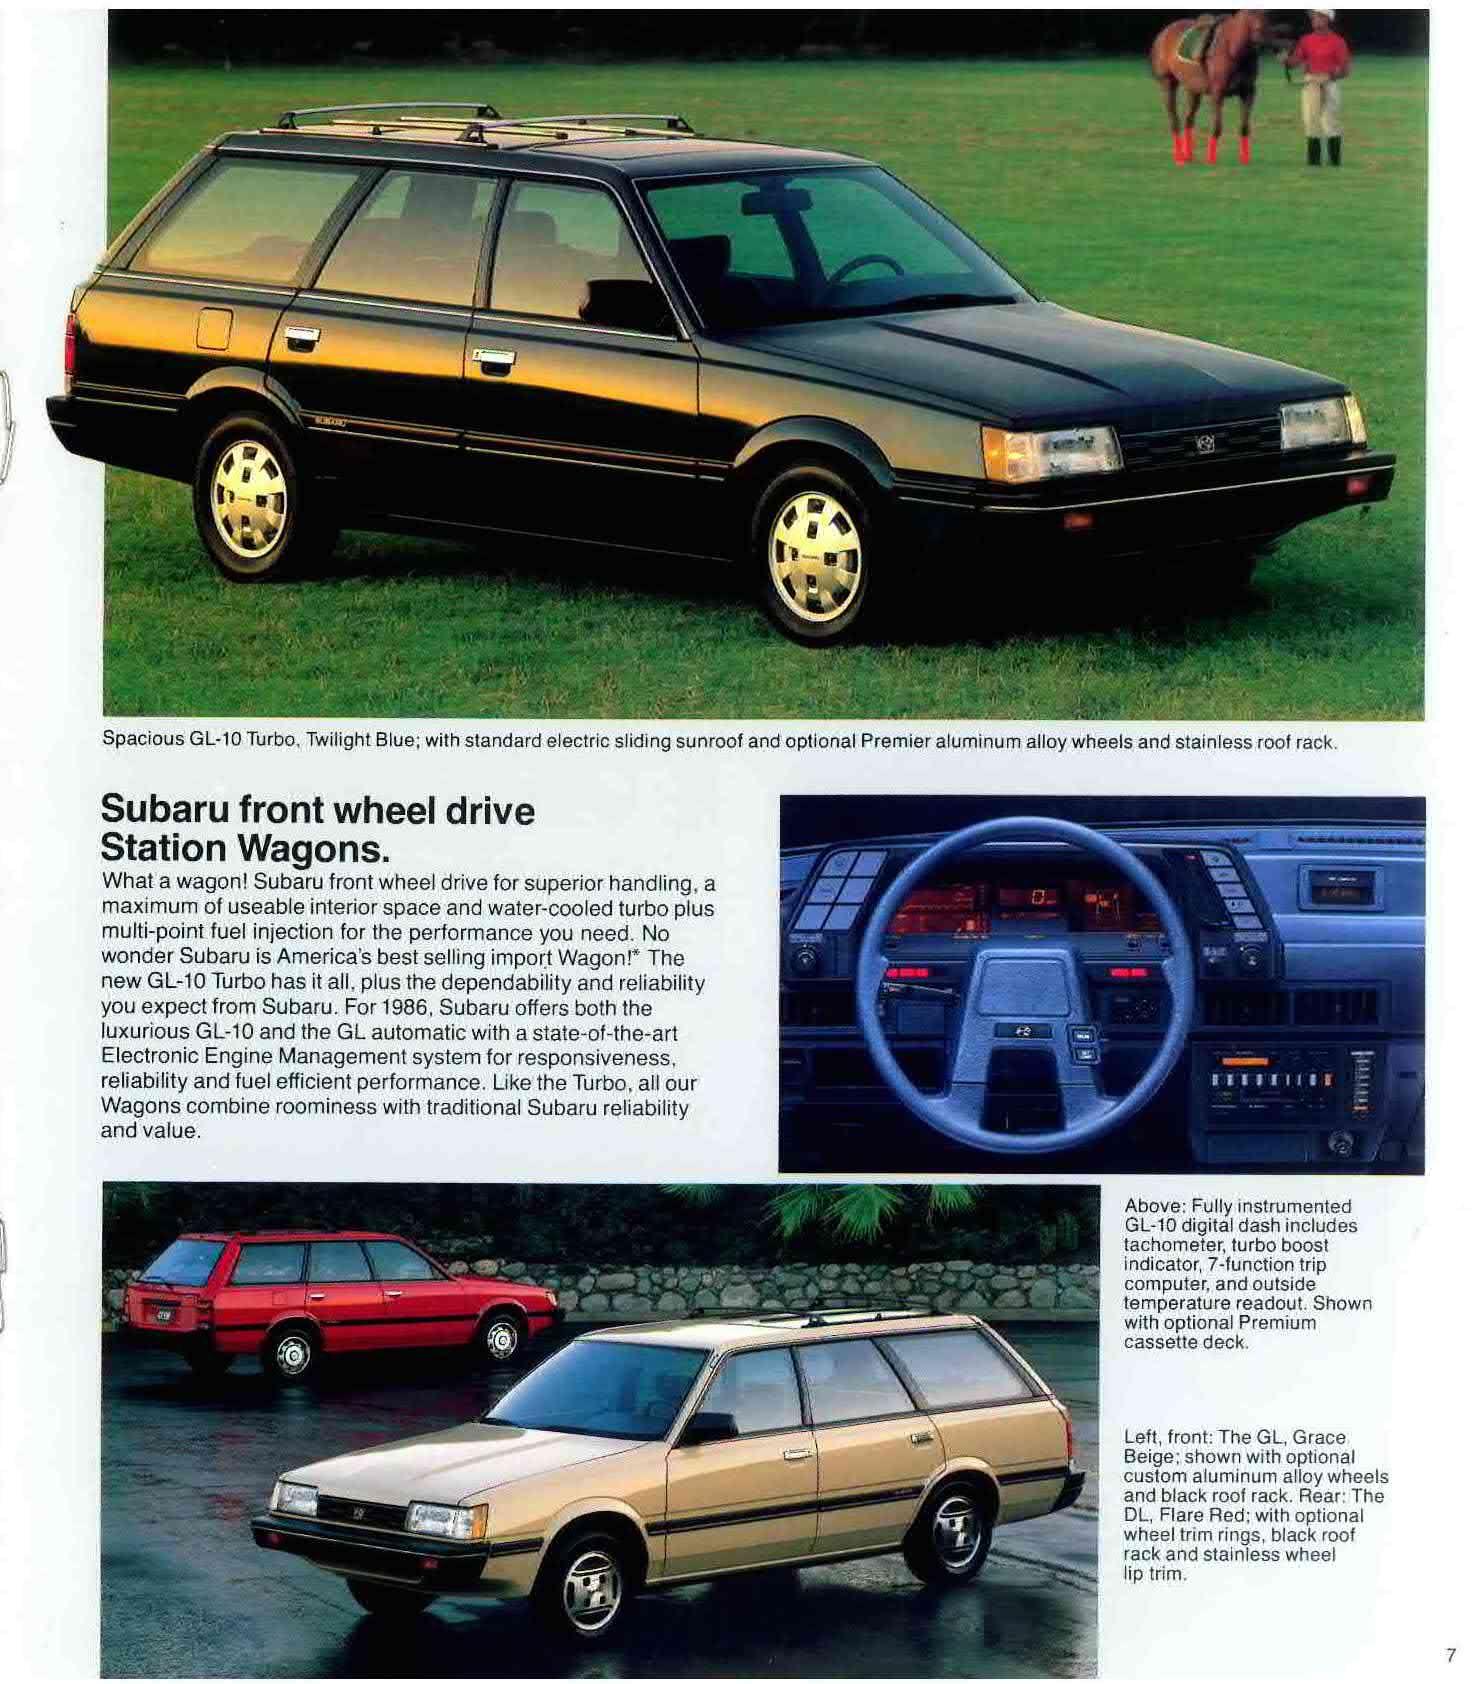 1986 Subaru Front Wheel Drive Station Wagons Look At Those H Wheels Retro Vintage Advertising Print Brochure Subaru Used Subaru Station Wagon